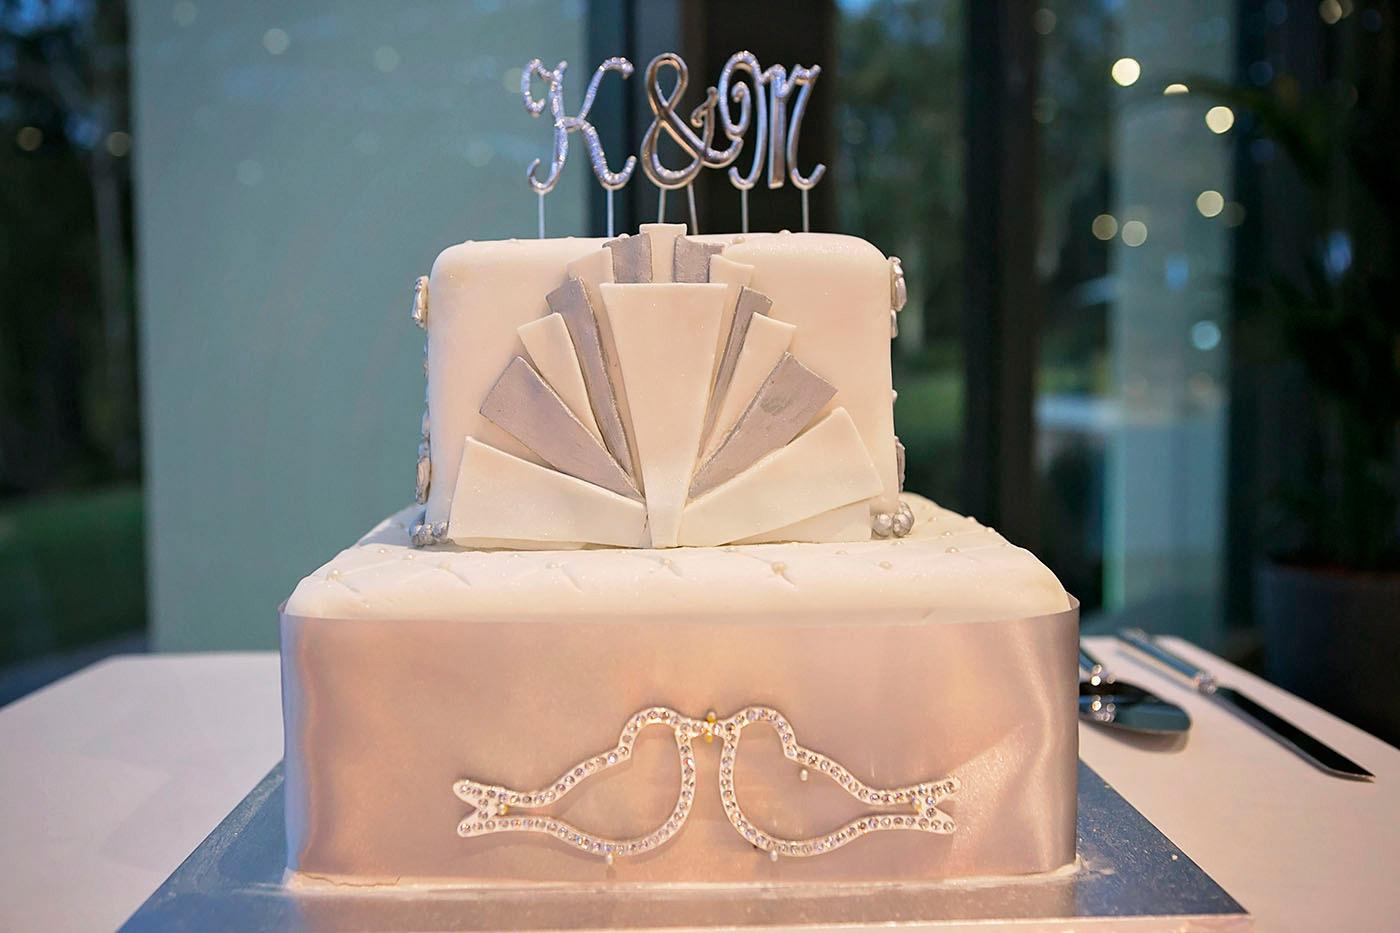 Binna burra wedding cakes